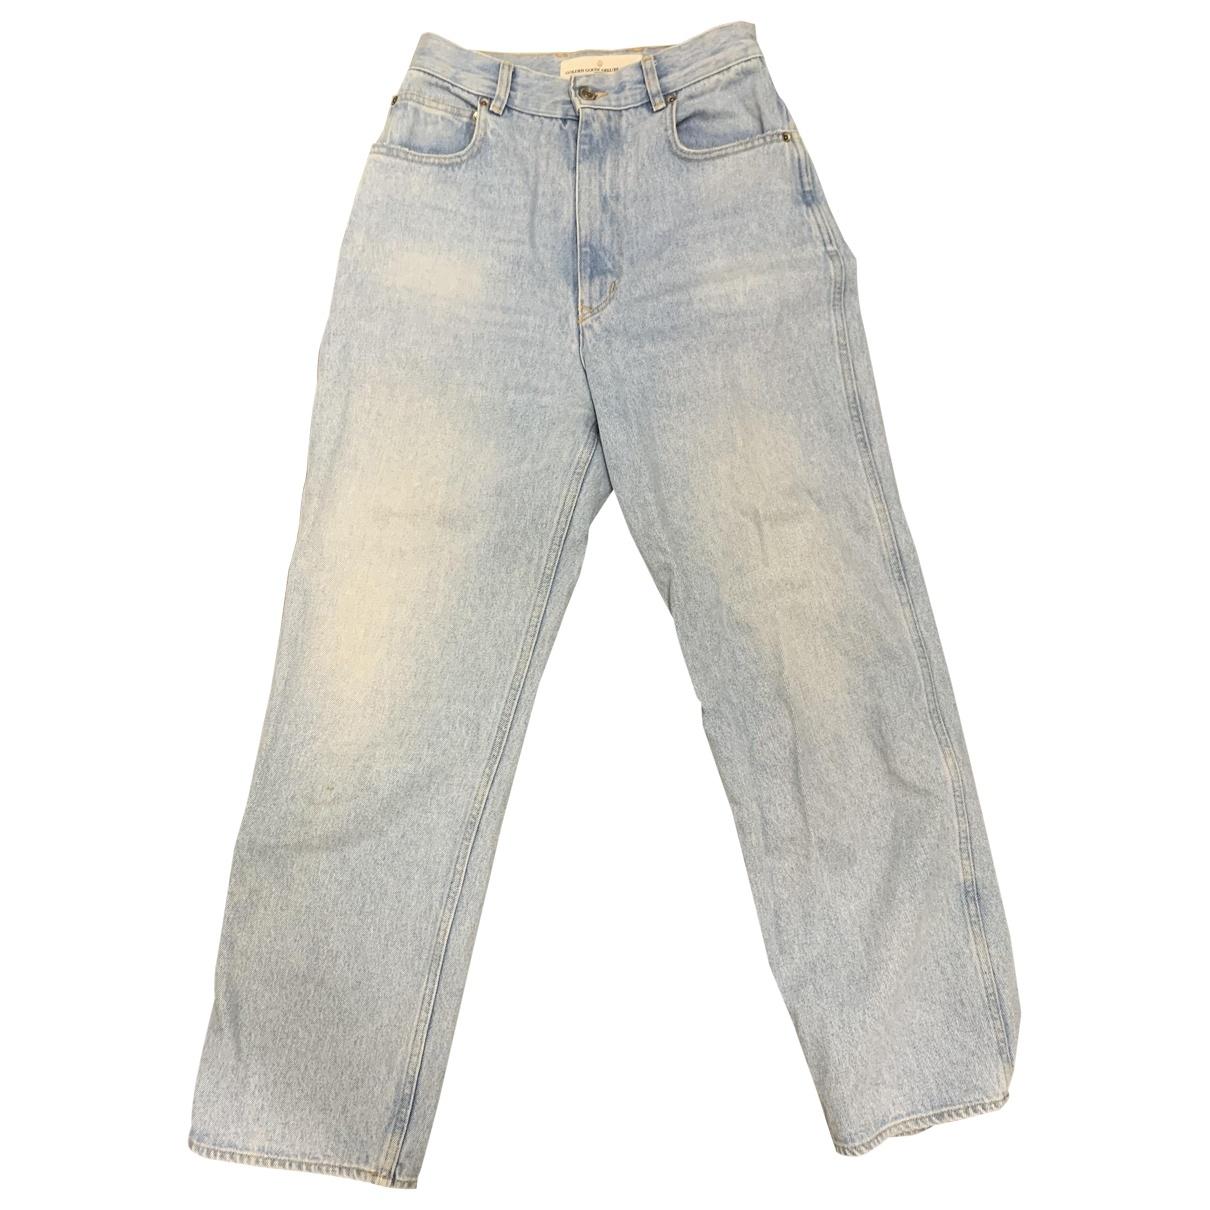 Golden Goose \N Blue Denim - Jeans Jeans for Women 27 US